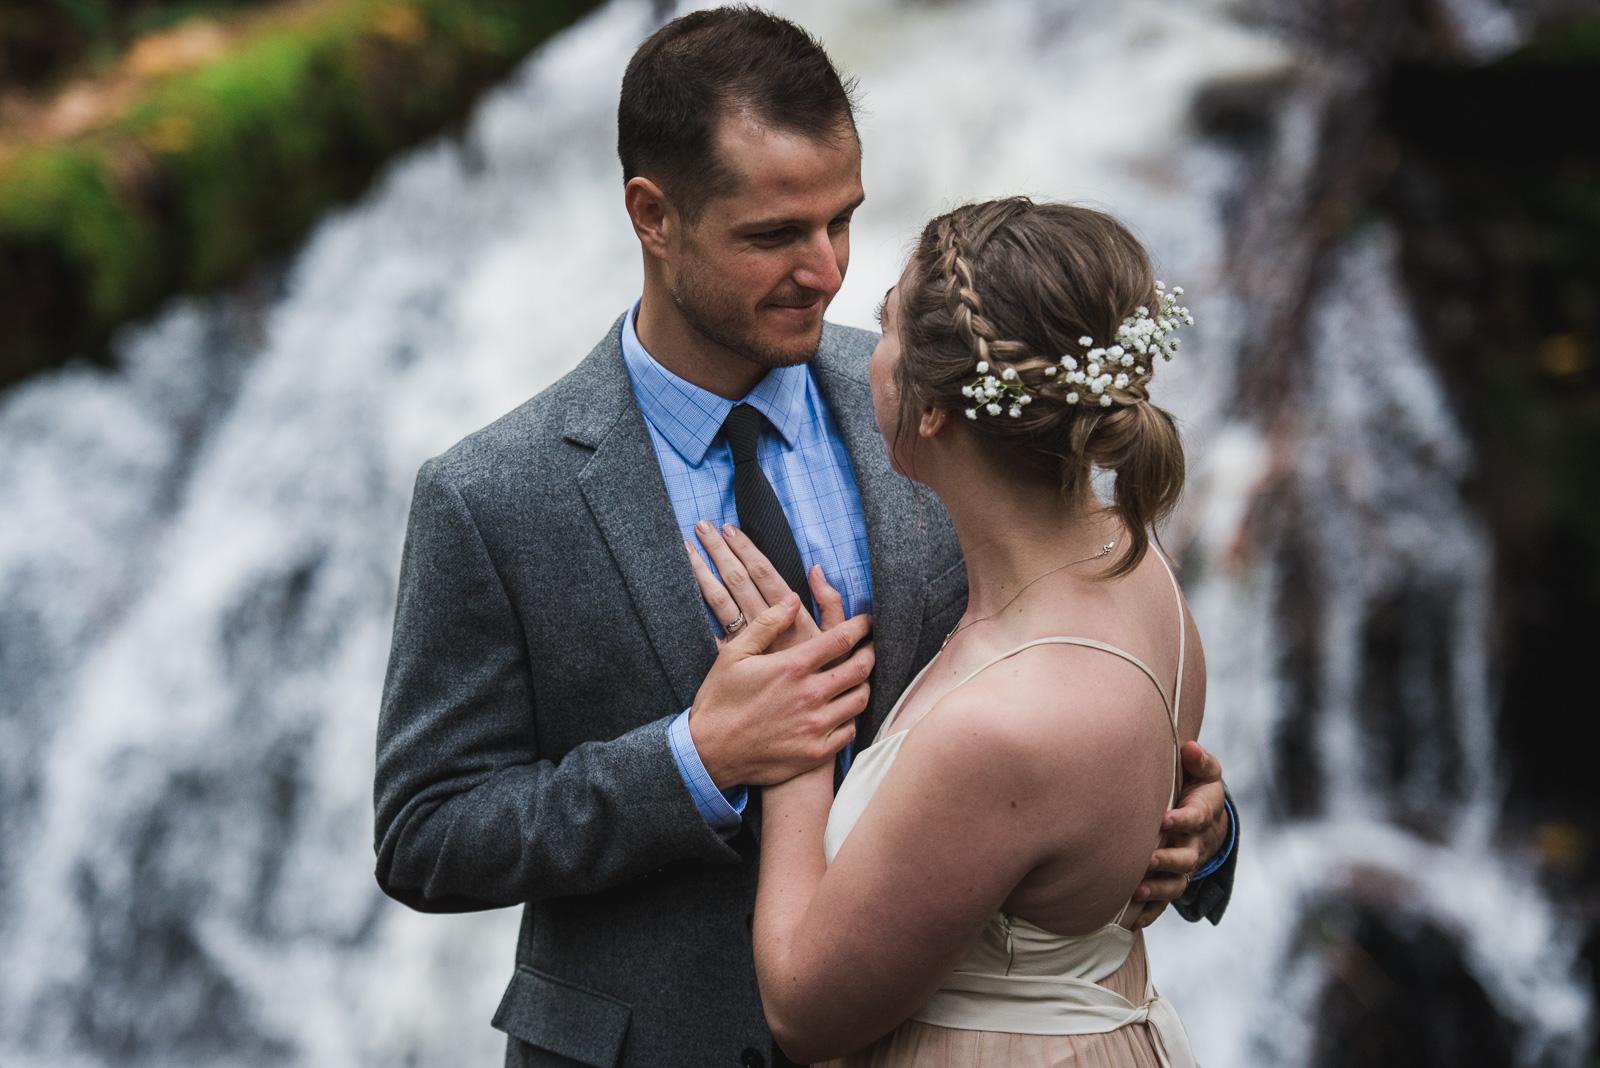 vancouver-island-wedding-photographers-cliff-gilker-park-smugglers-cove-elopement-20.jpg